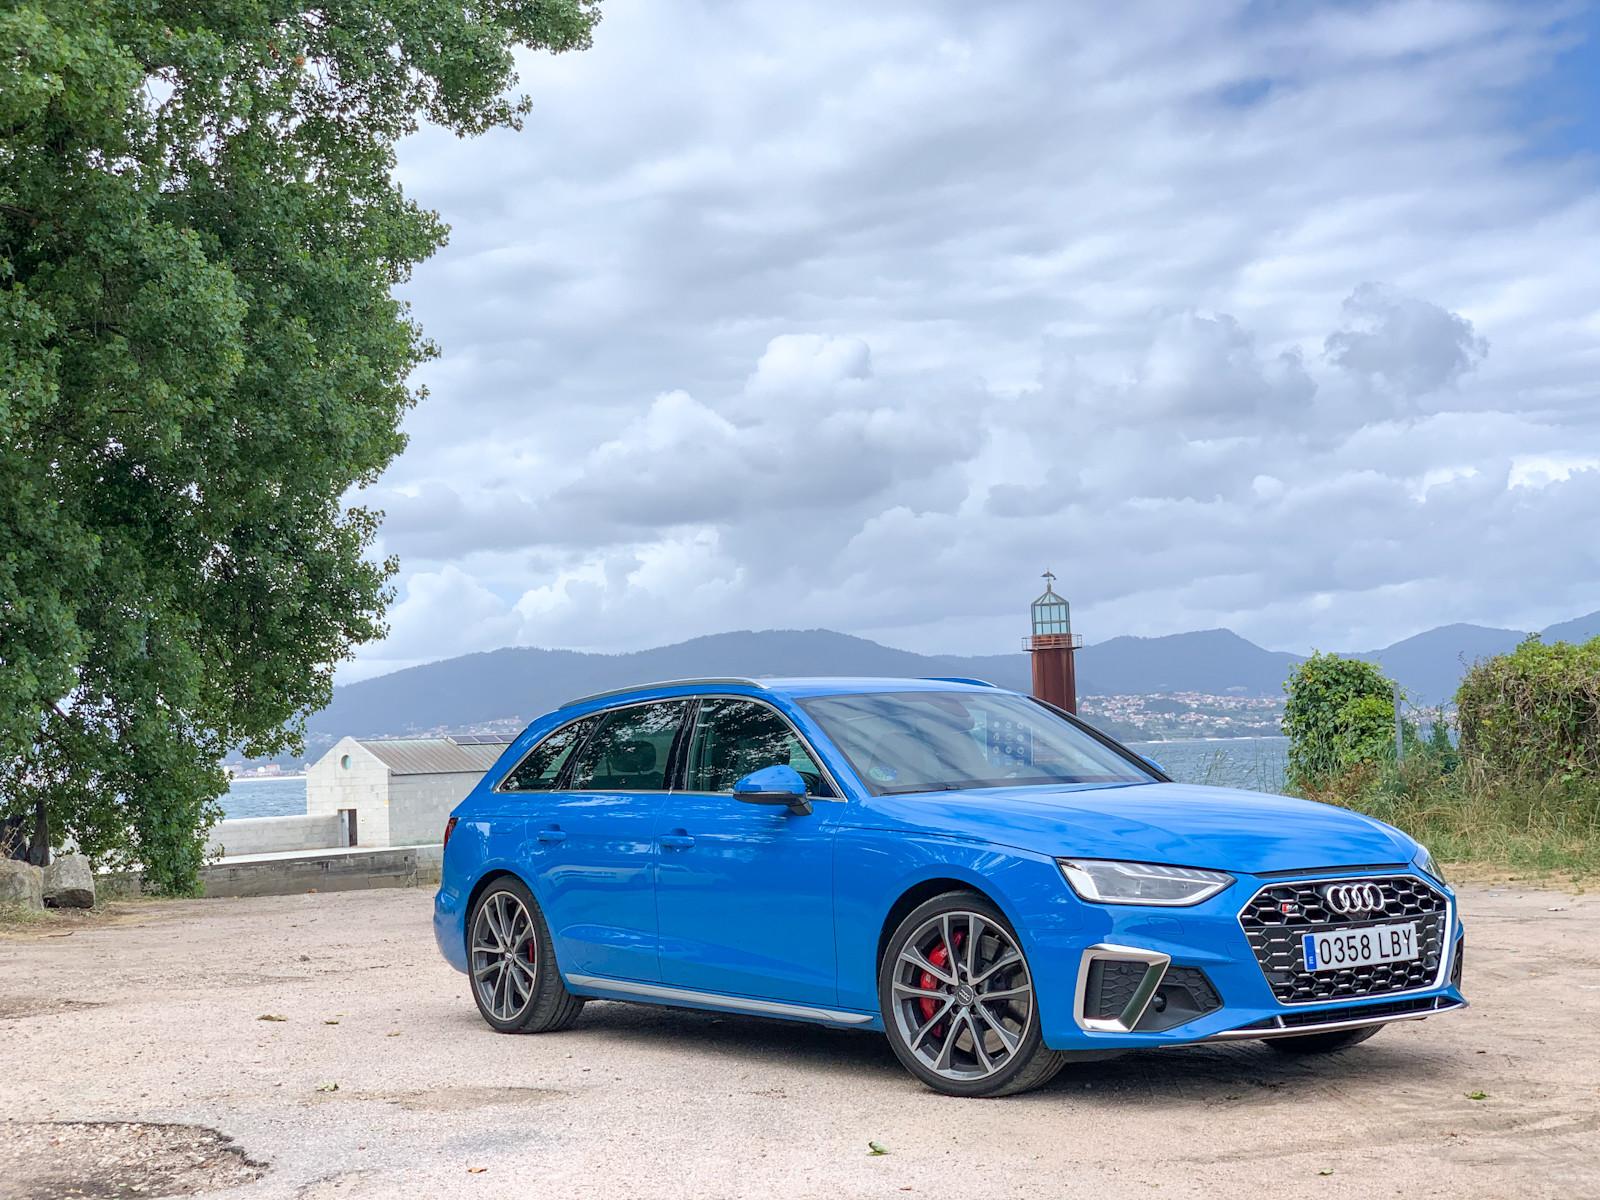 Foto de Audi S4 Avant 2020 (prueba) (23/26)